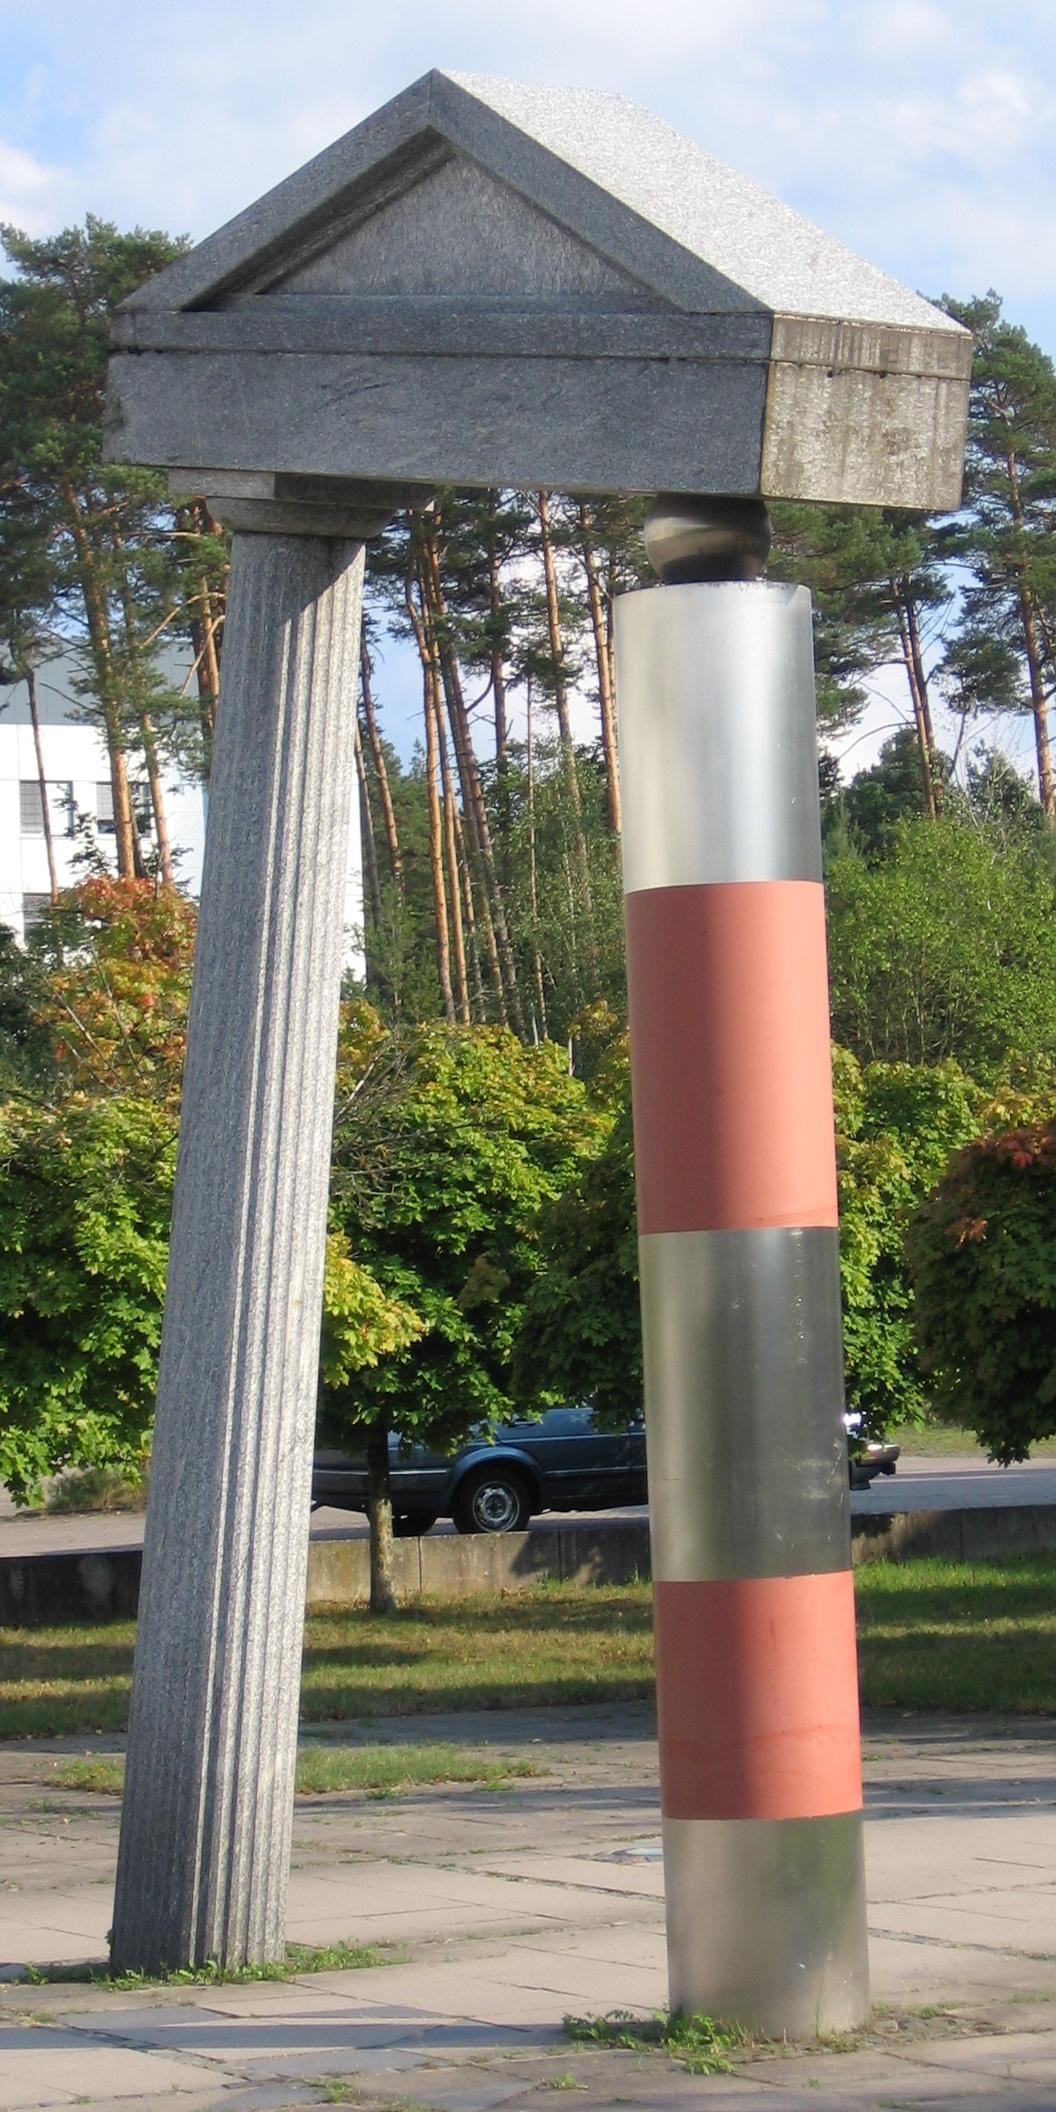 Skulpturenpark tu kaiserslautern wikipedia for Raumgestaltung tu kl